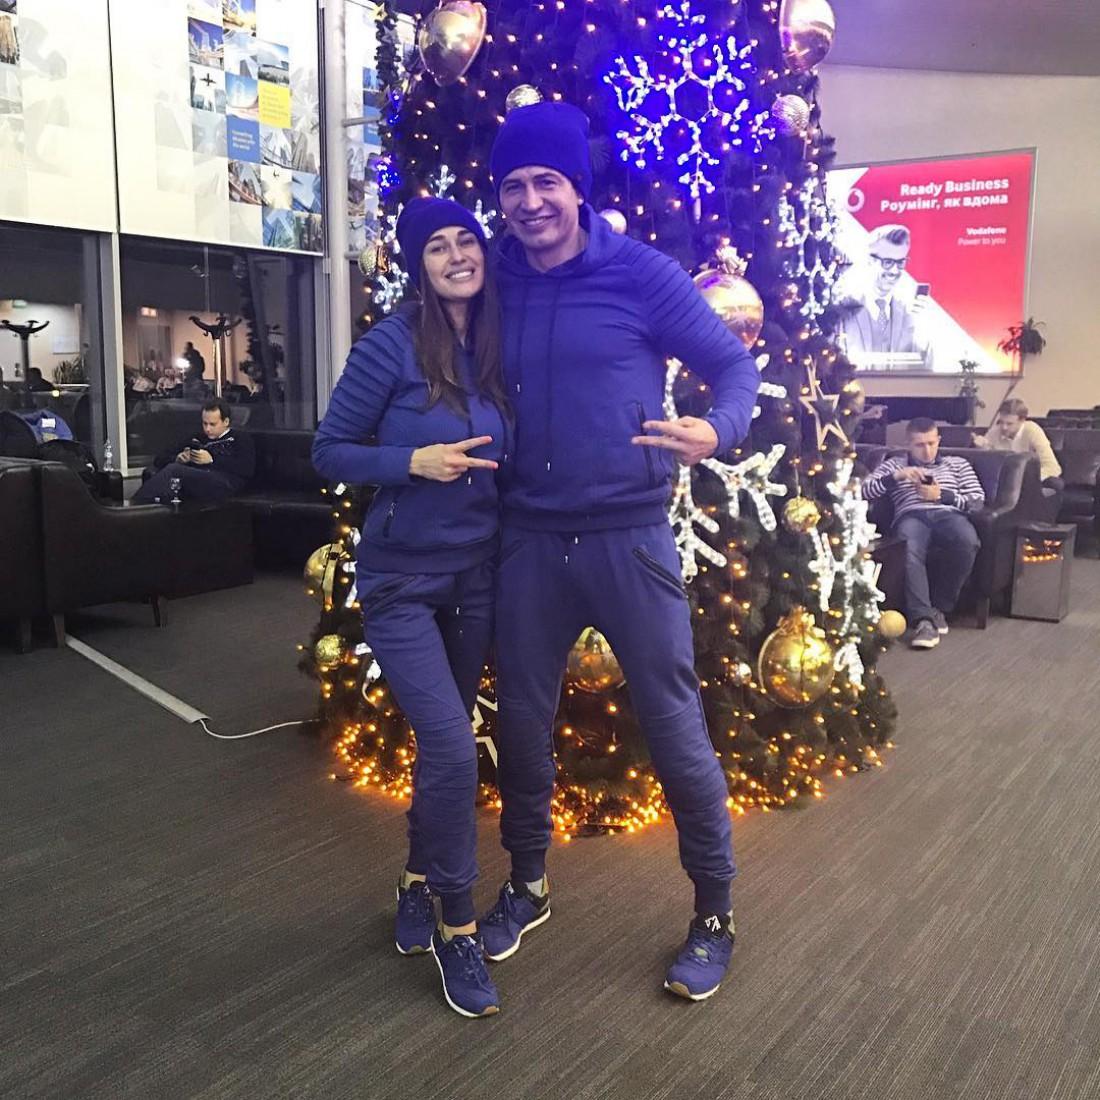 Джеджула со своей девушкой в аэропорту